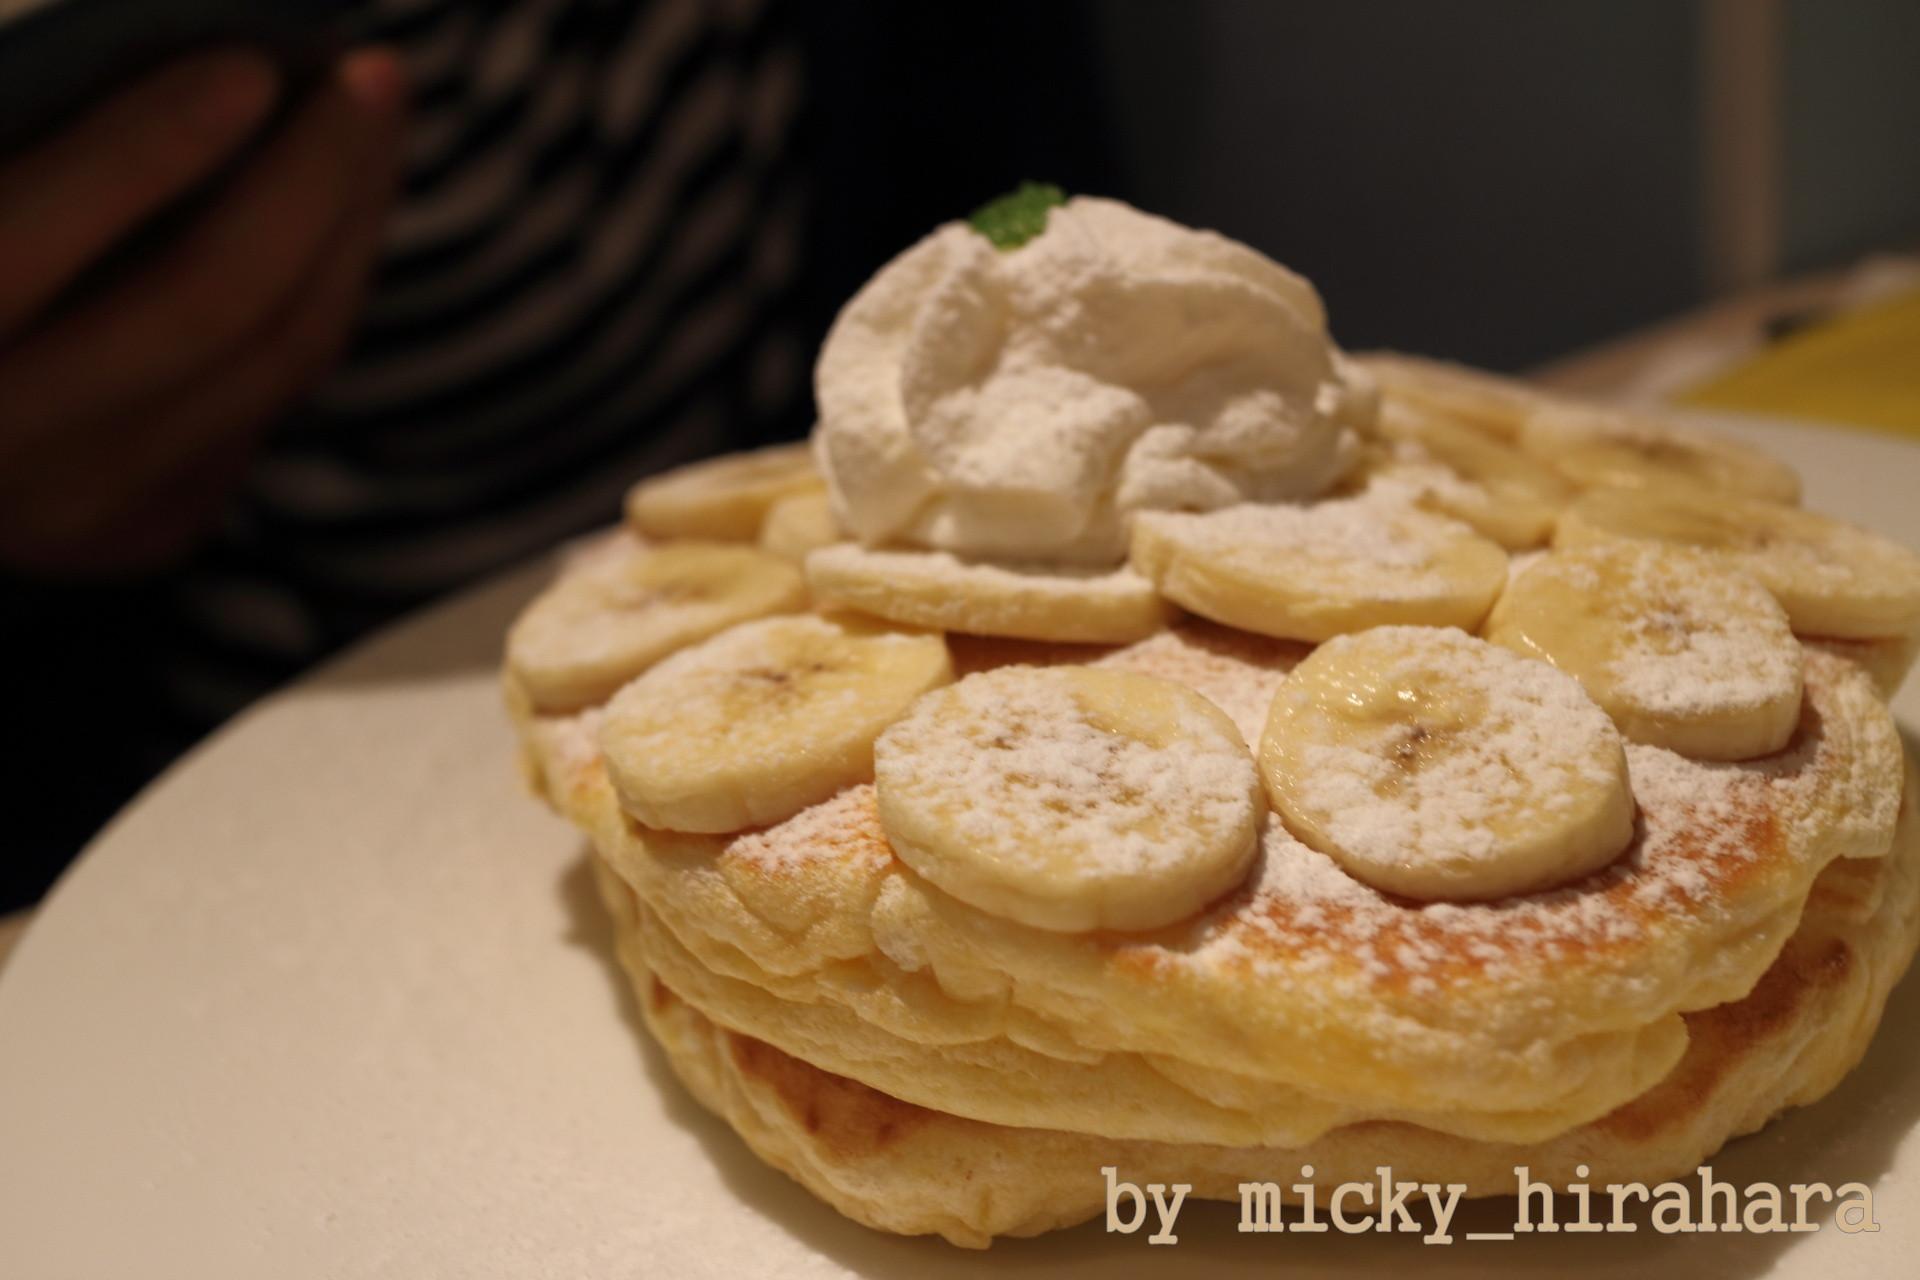 Mokes Bread And Breakfast  Moke's Bread and Breakfast(中目黒)ハワイアンパンケーキが食べられるおしゃれカフェ